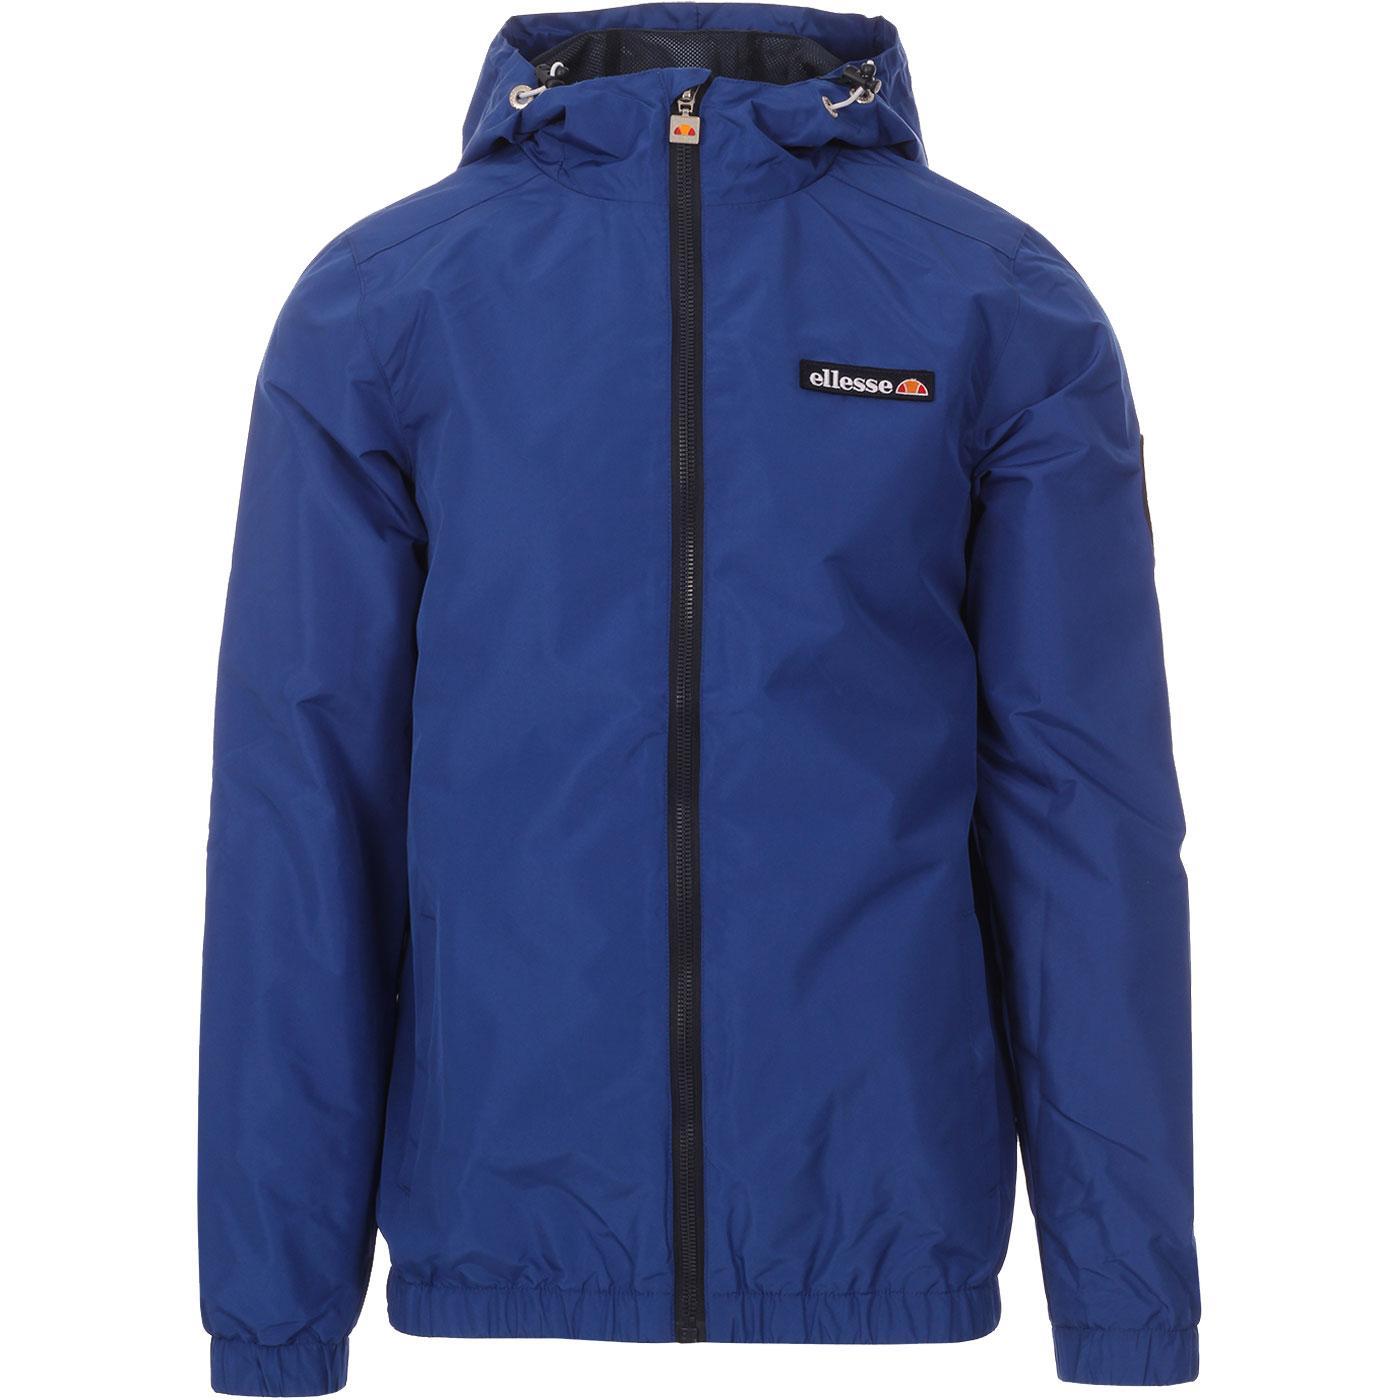 Terrazzo ELLESSE Men's 80's Hooded Terrace Jacket